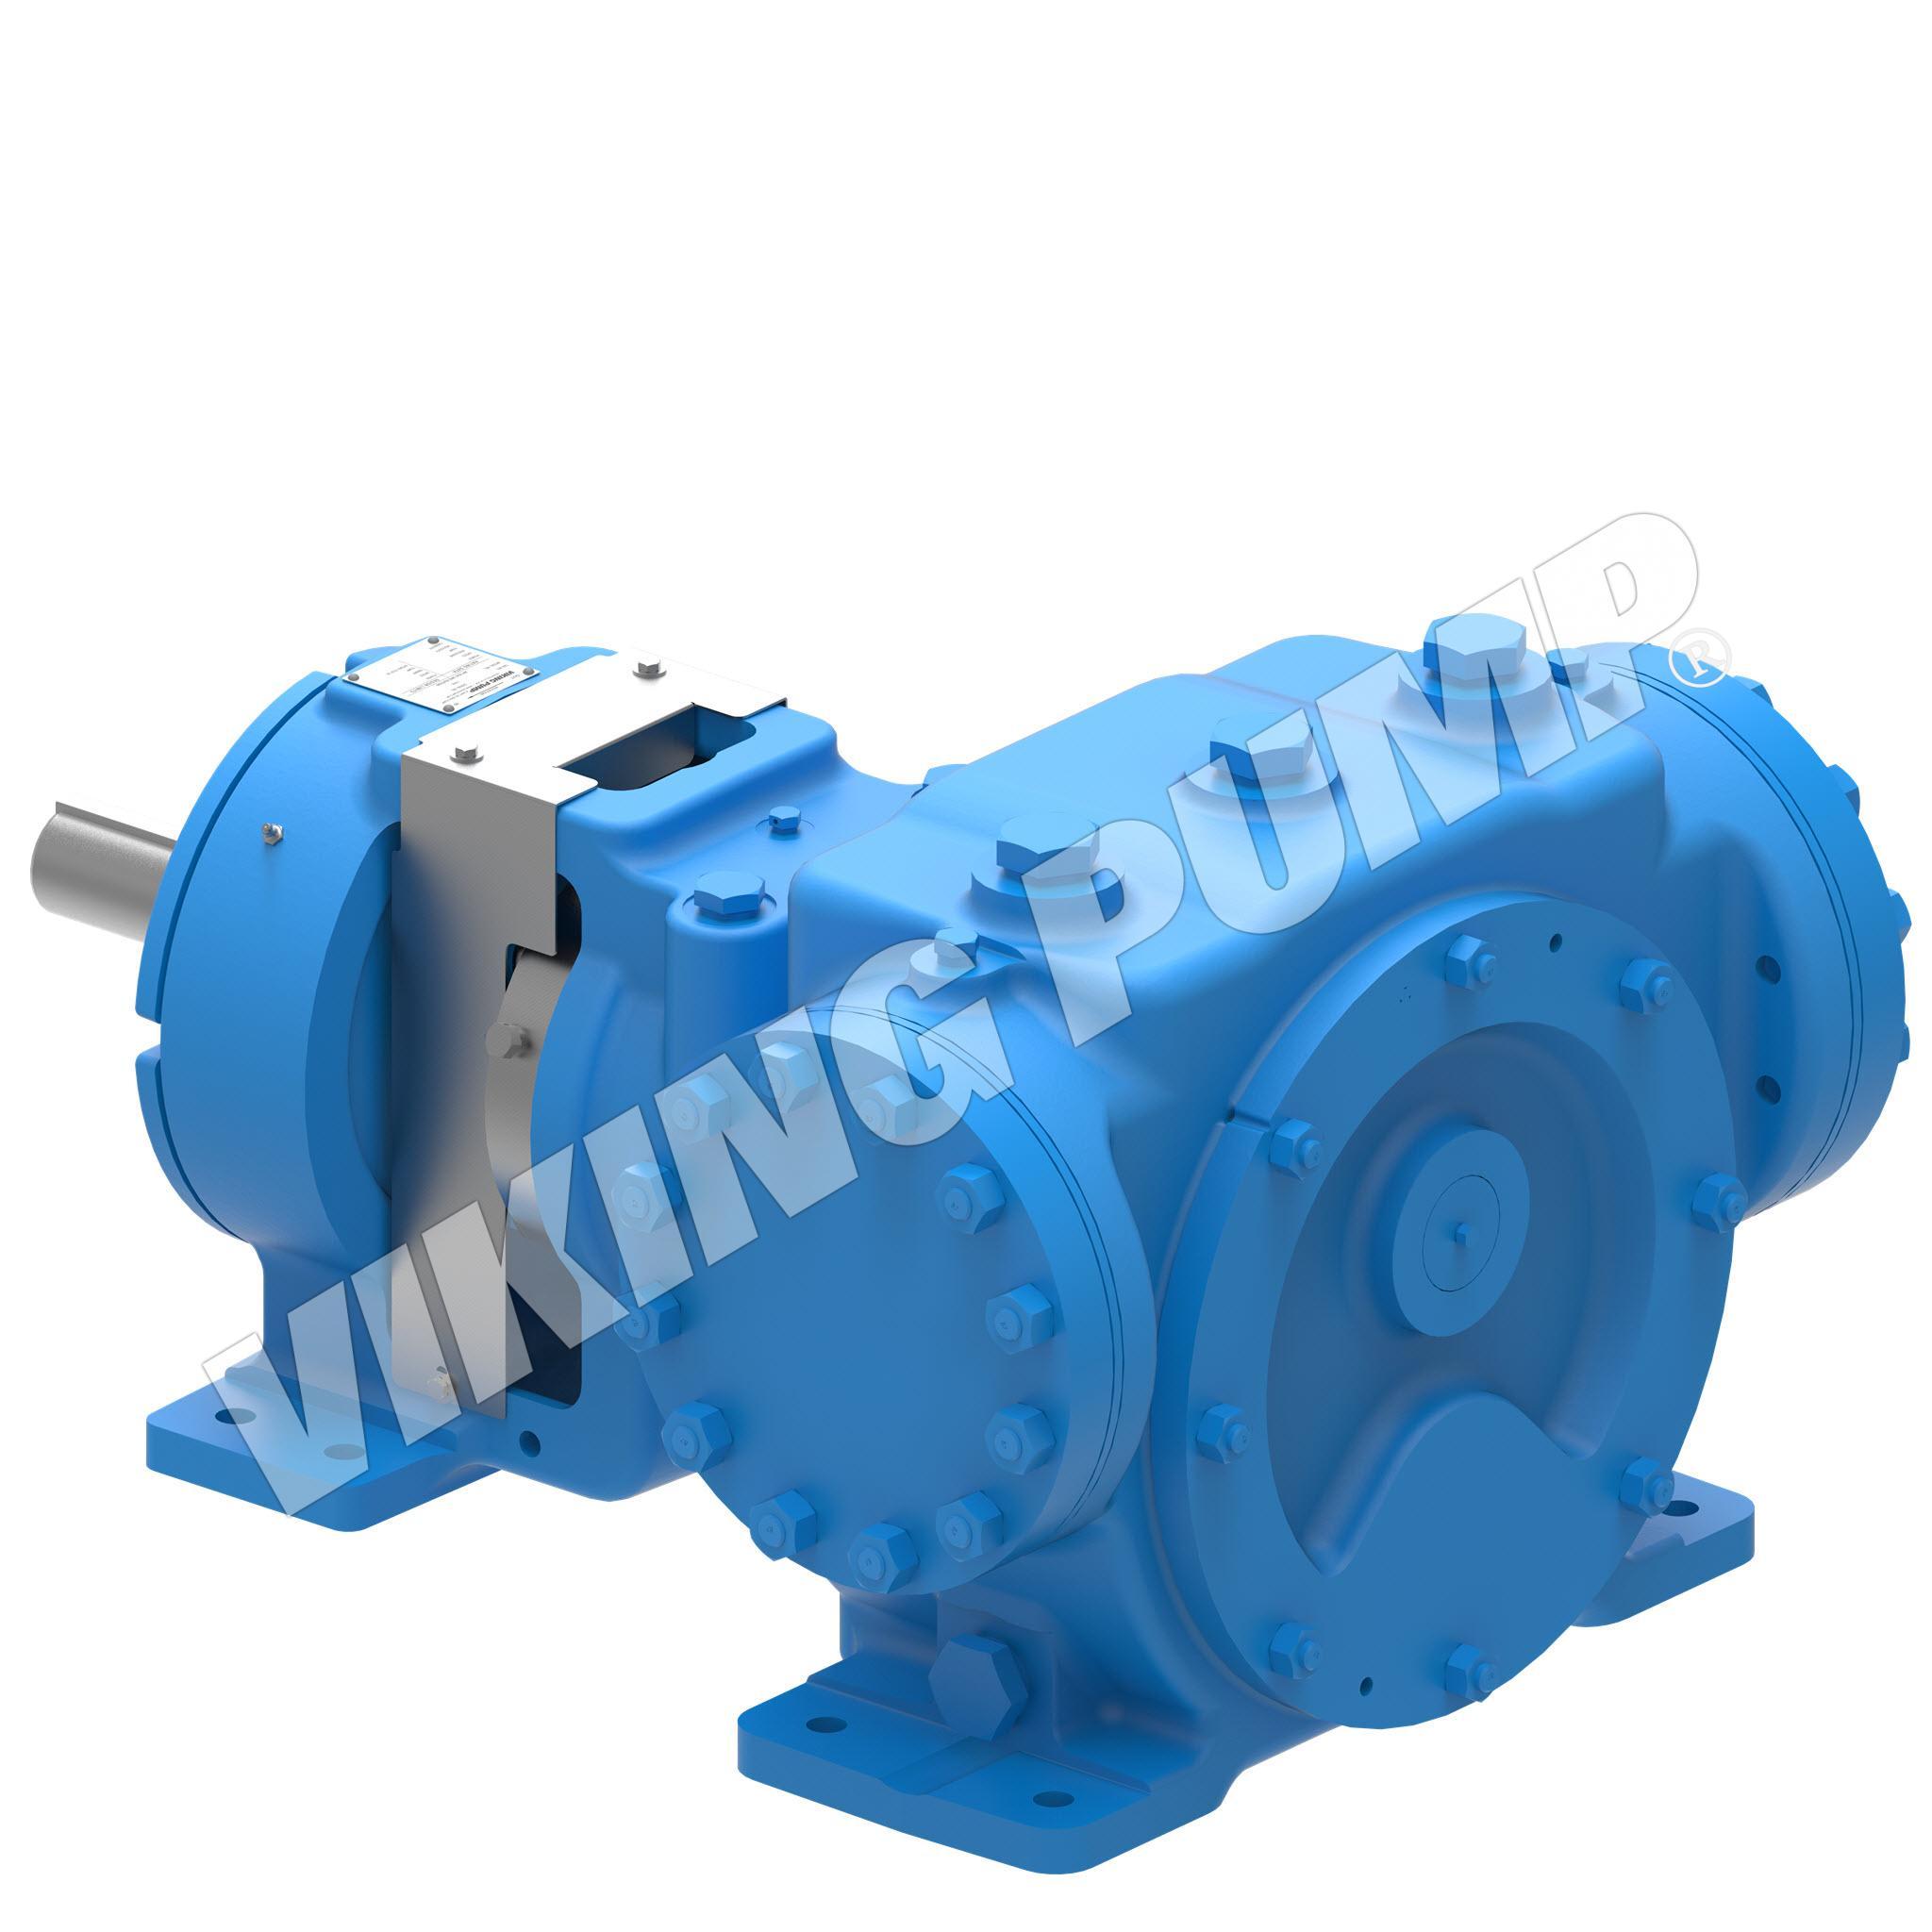 Model N4323AX, Foot-Mounted, API 682 Seal, API 676-Compliant Pump